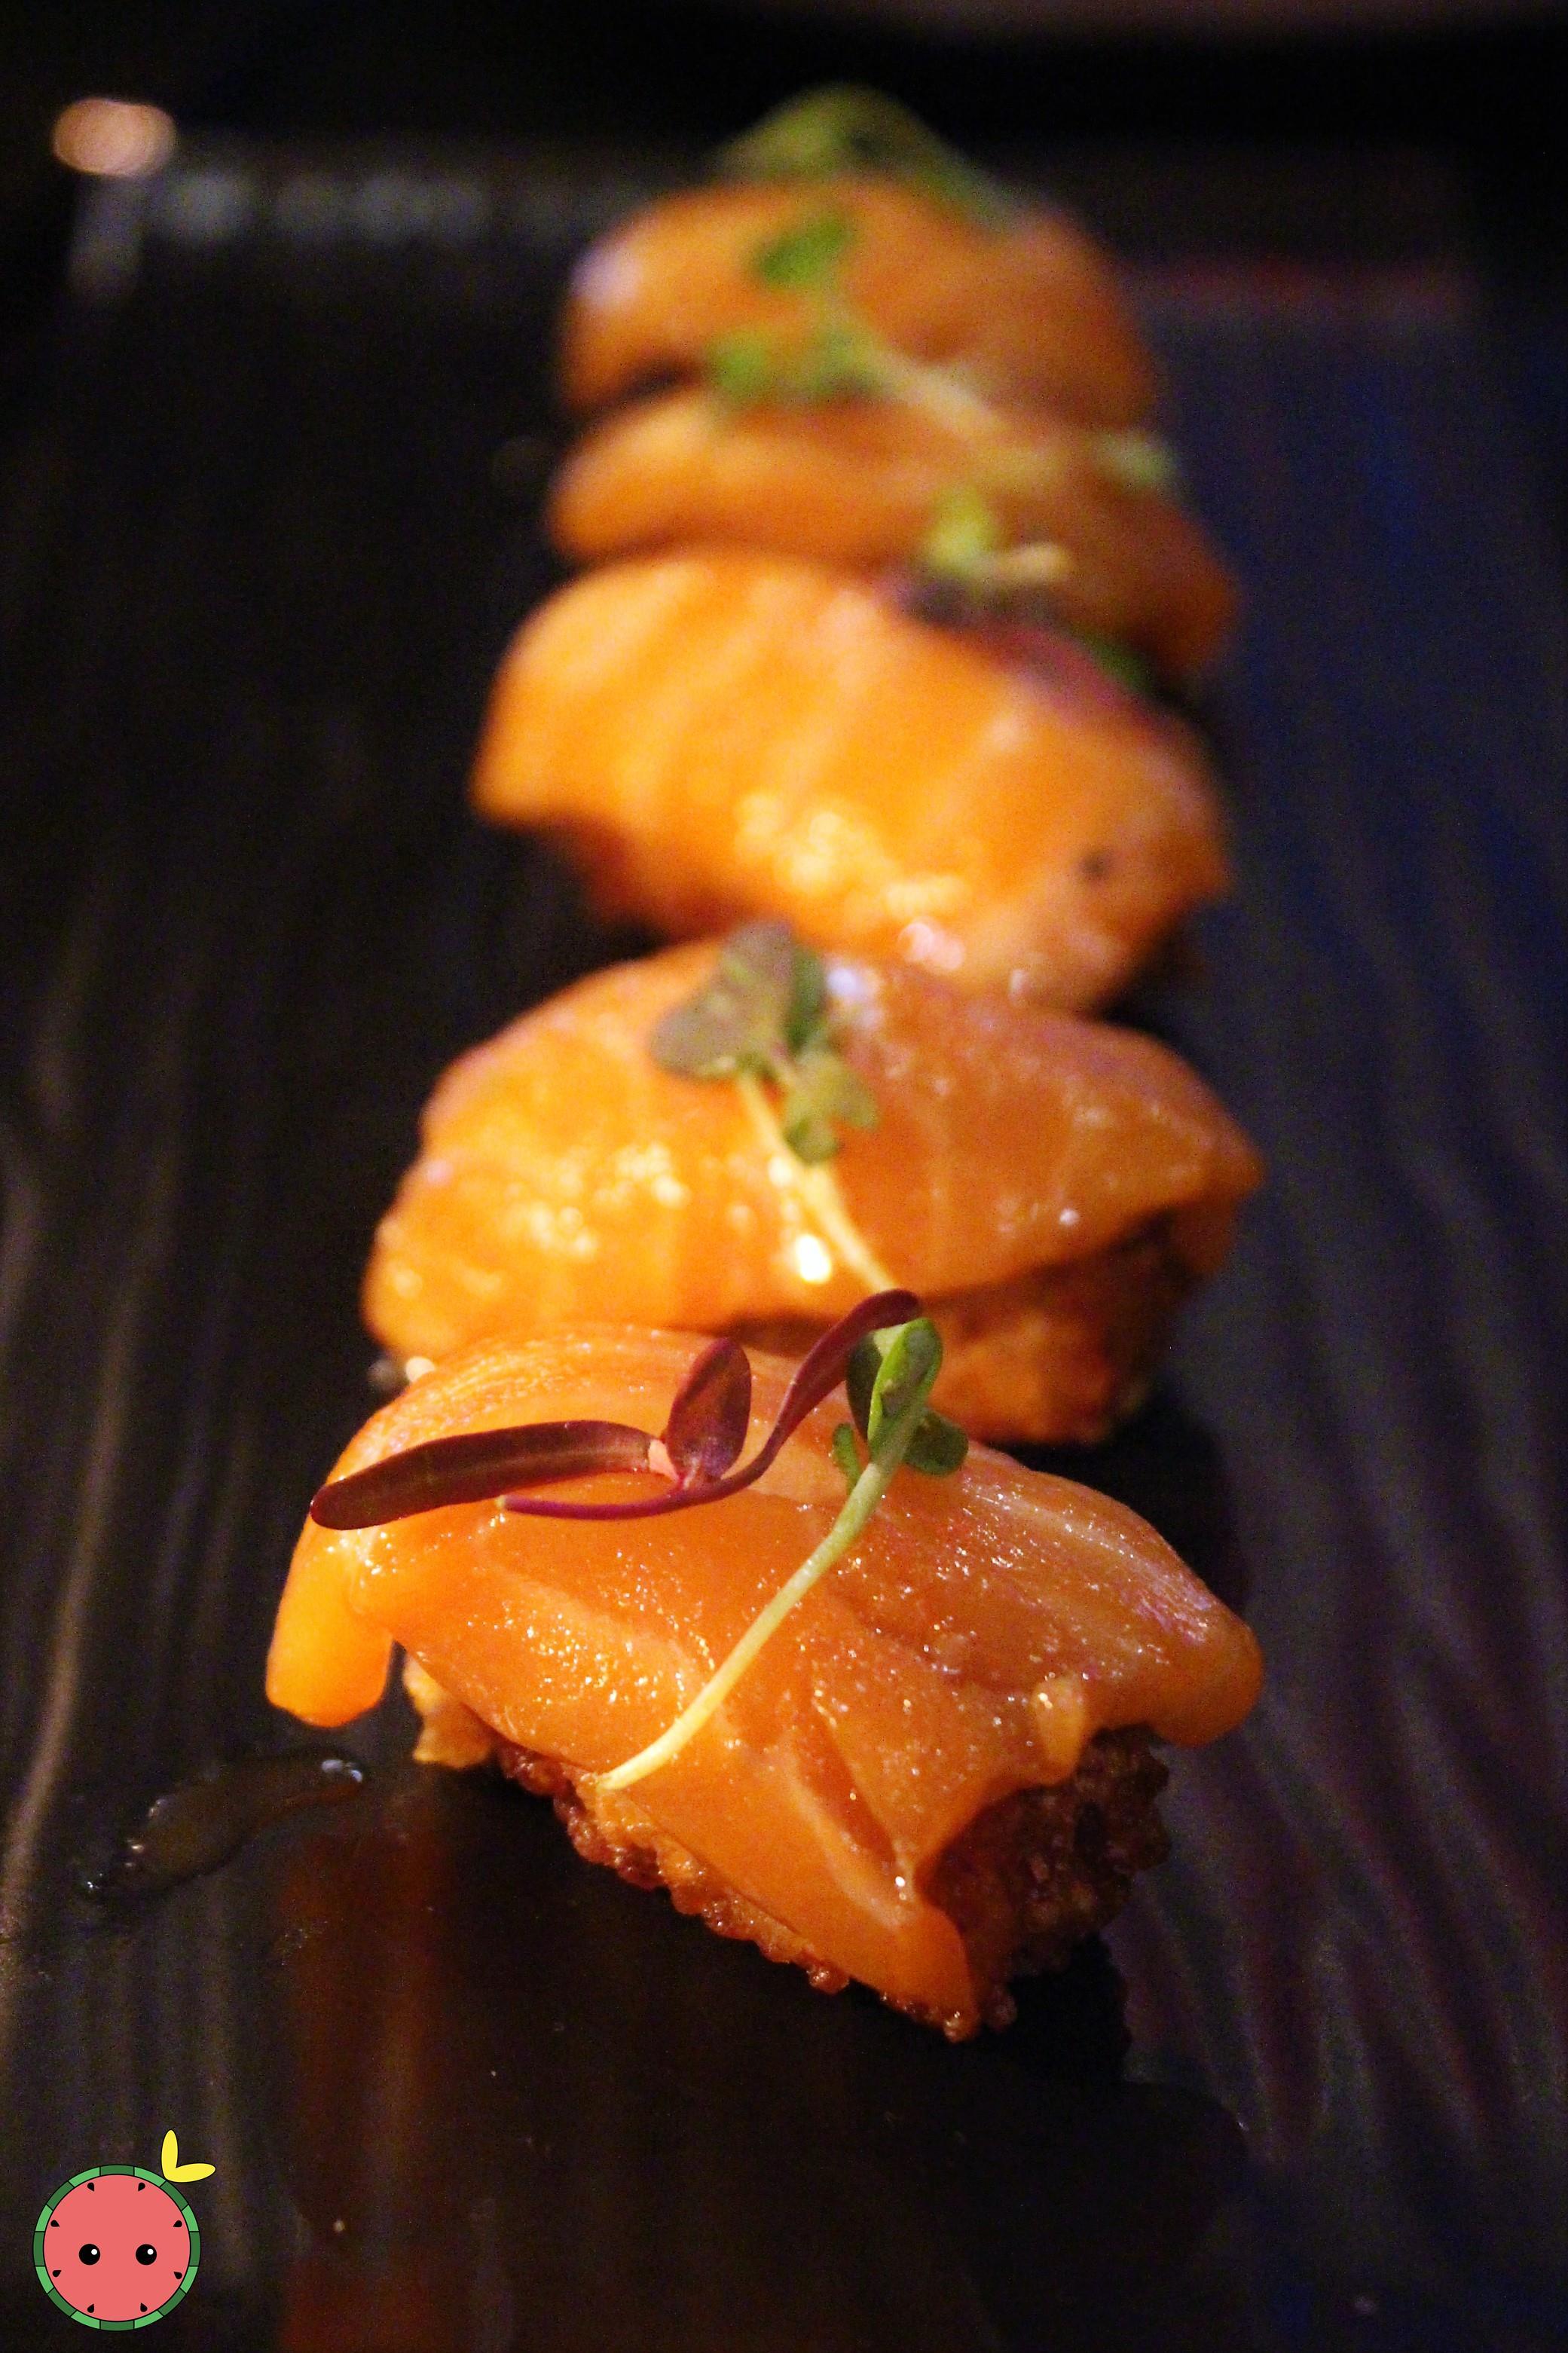 Crispy Salmon - Salmon sashimi, crispy sushi rice, chipotle aioli